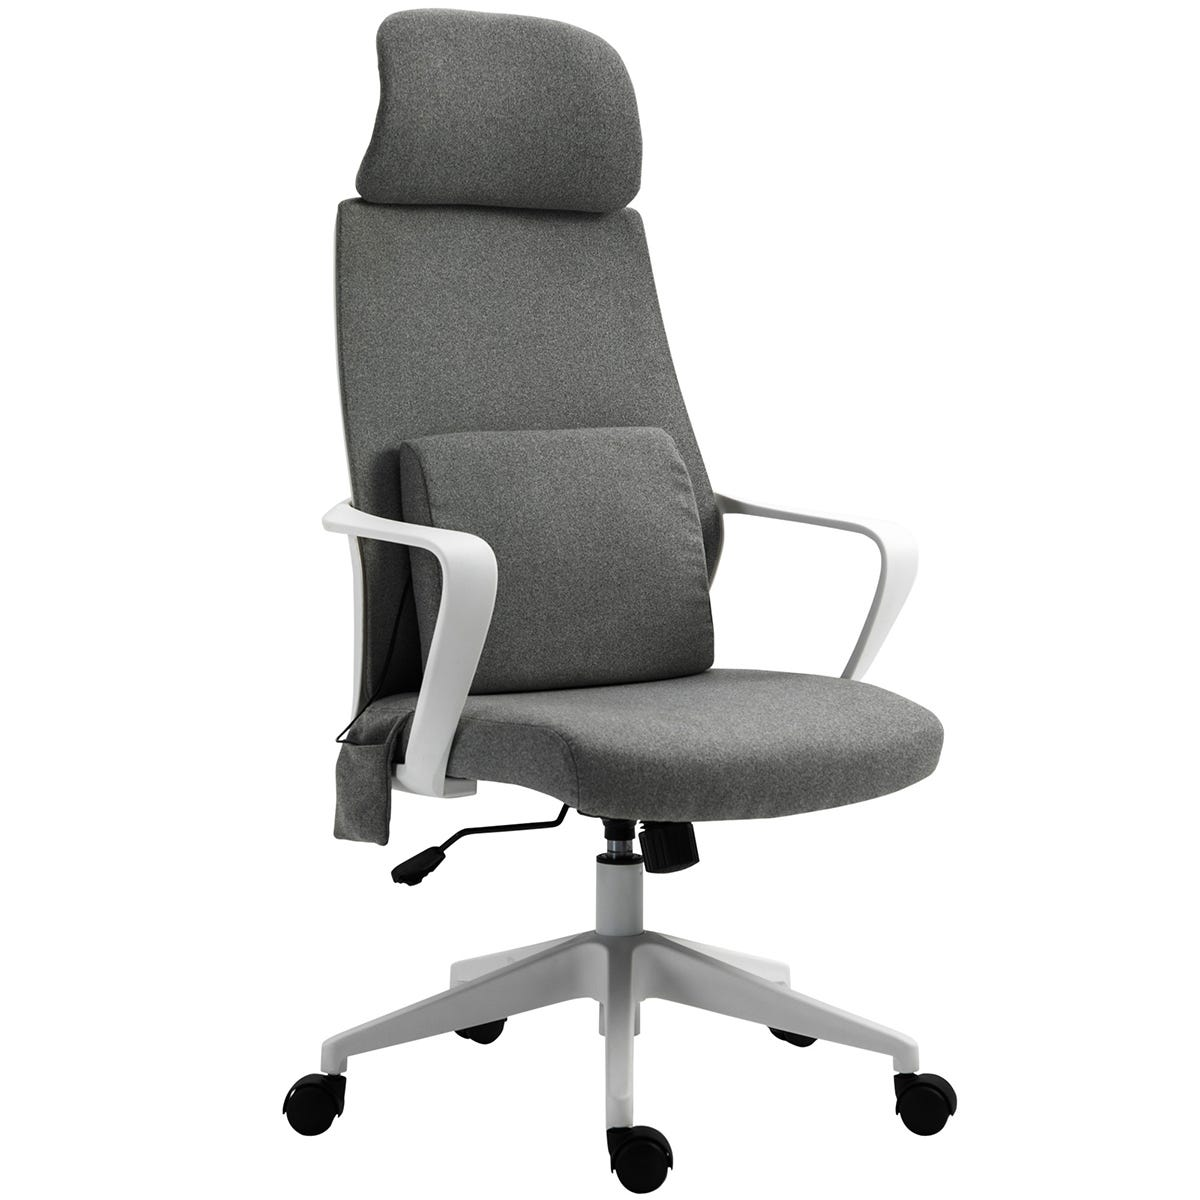 Solstice Nara Fabric Office Chair with Massaging Lumbar Cushion - Grey